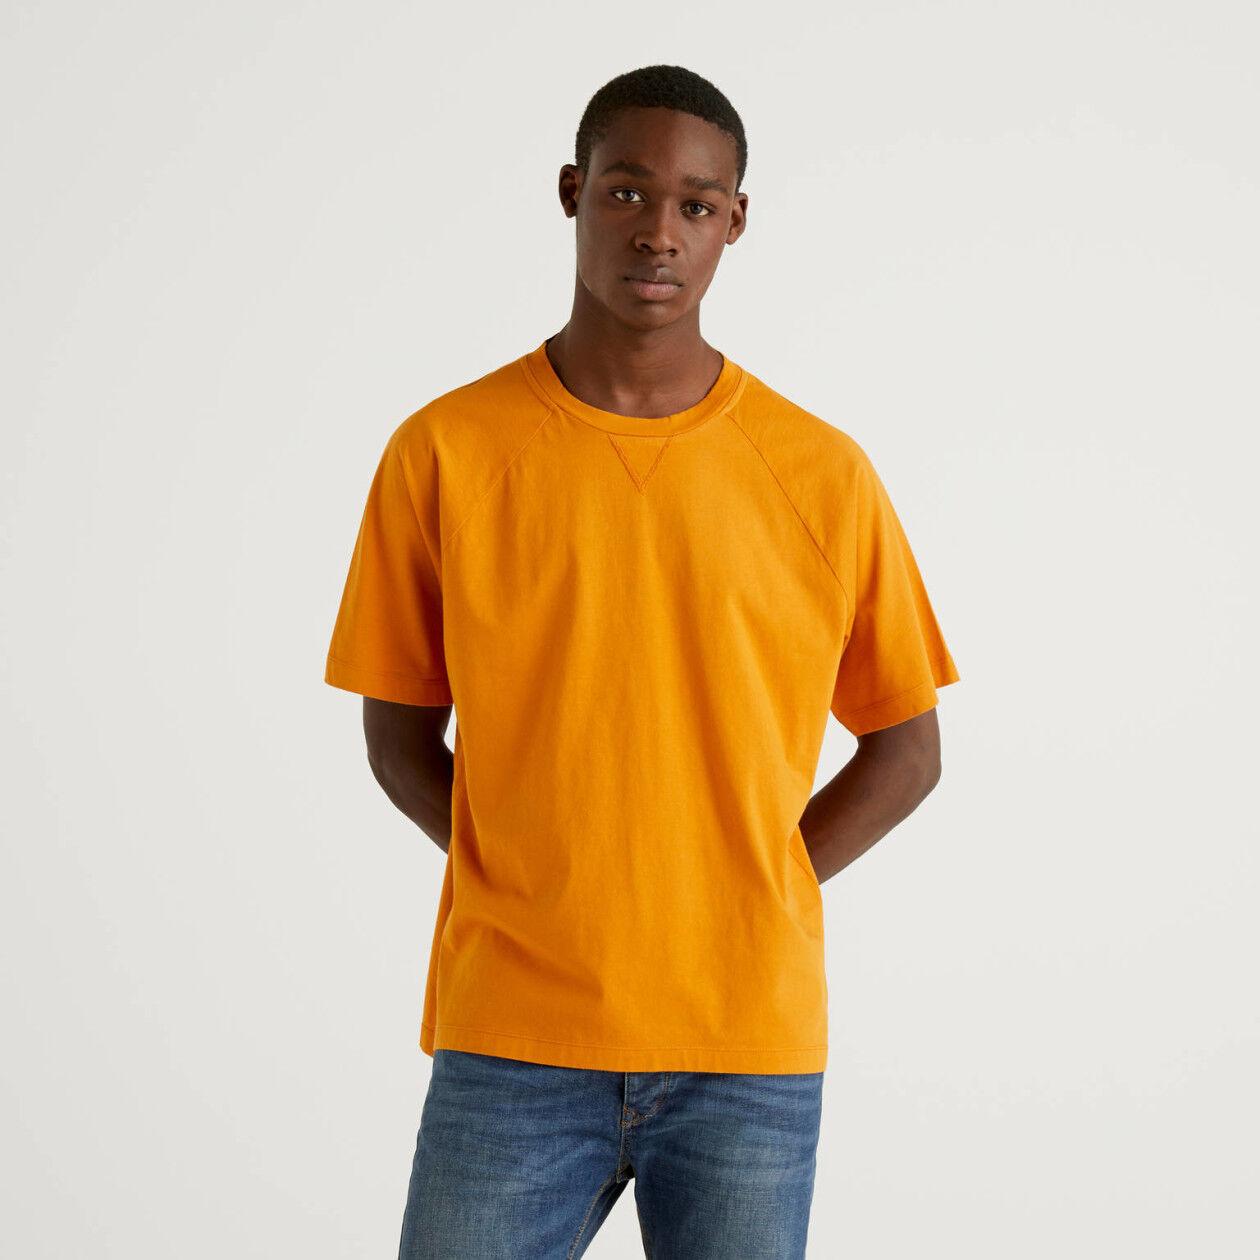 Camiseta de 100 % algodón con manga raglán